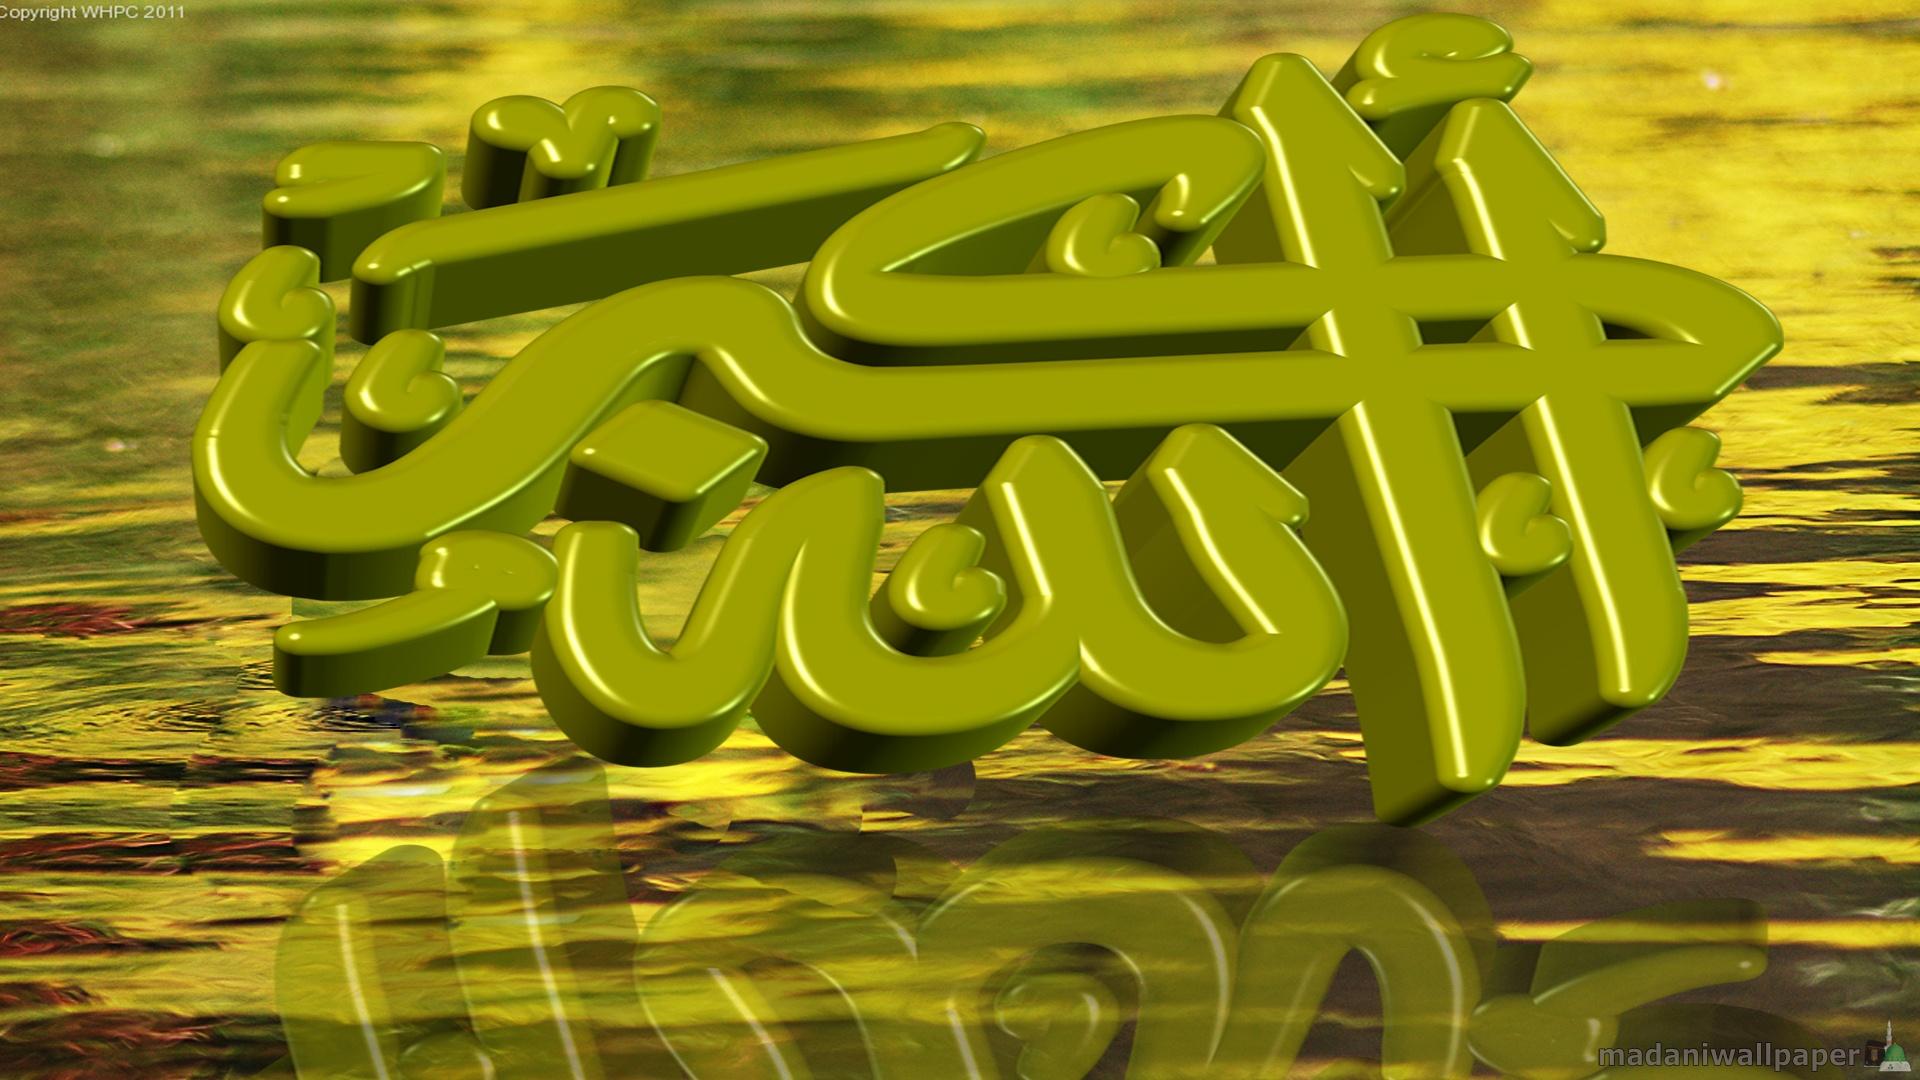 How to set 3D New Islamic Wallpaper wallpaper on your desktop 1920x1080